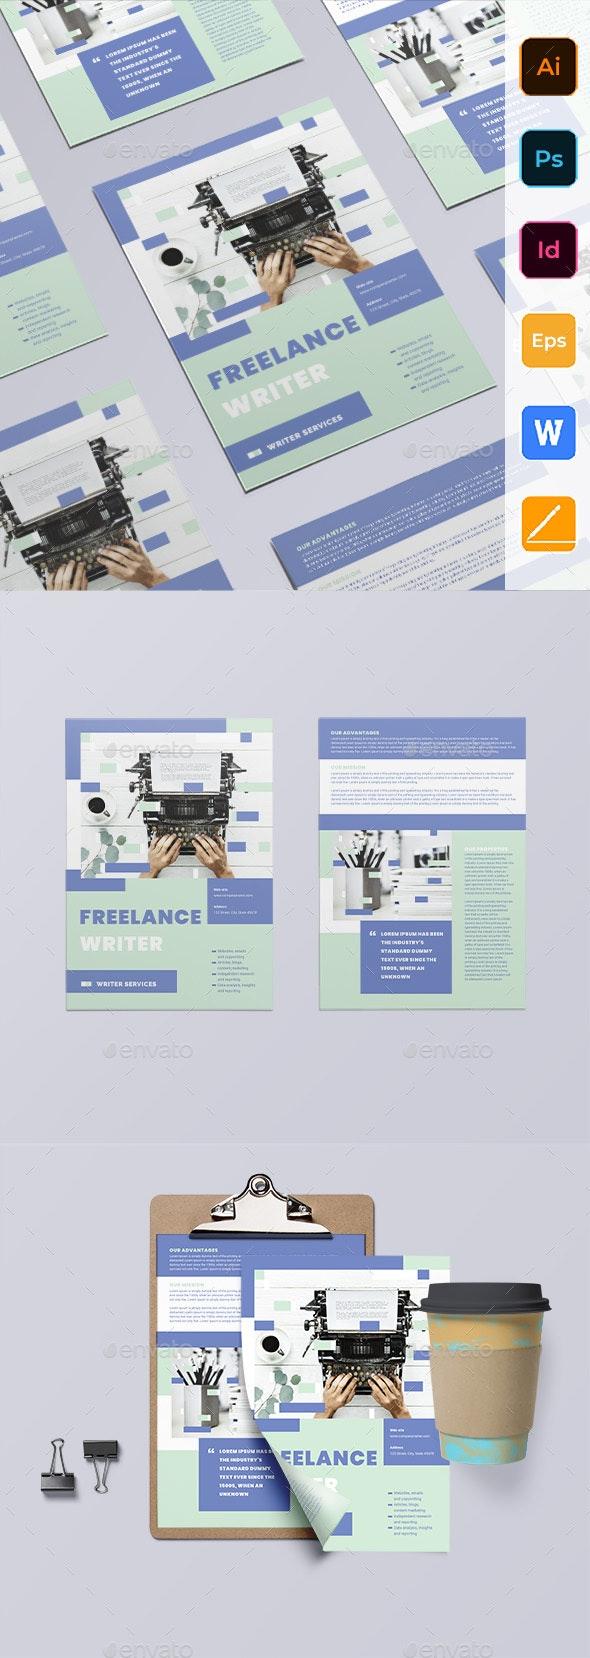 Freelance Writer Flyer - Corporate Flyers